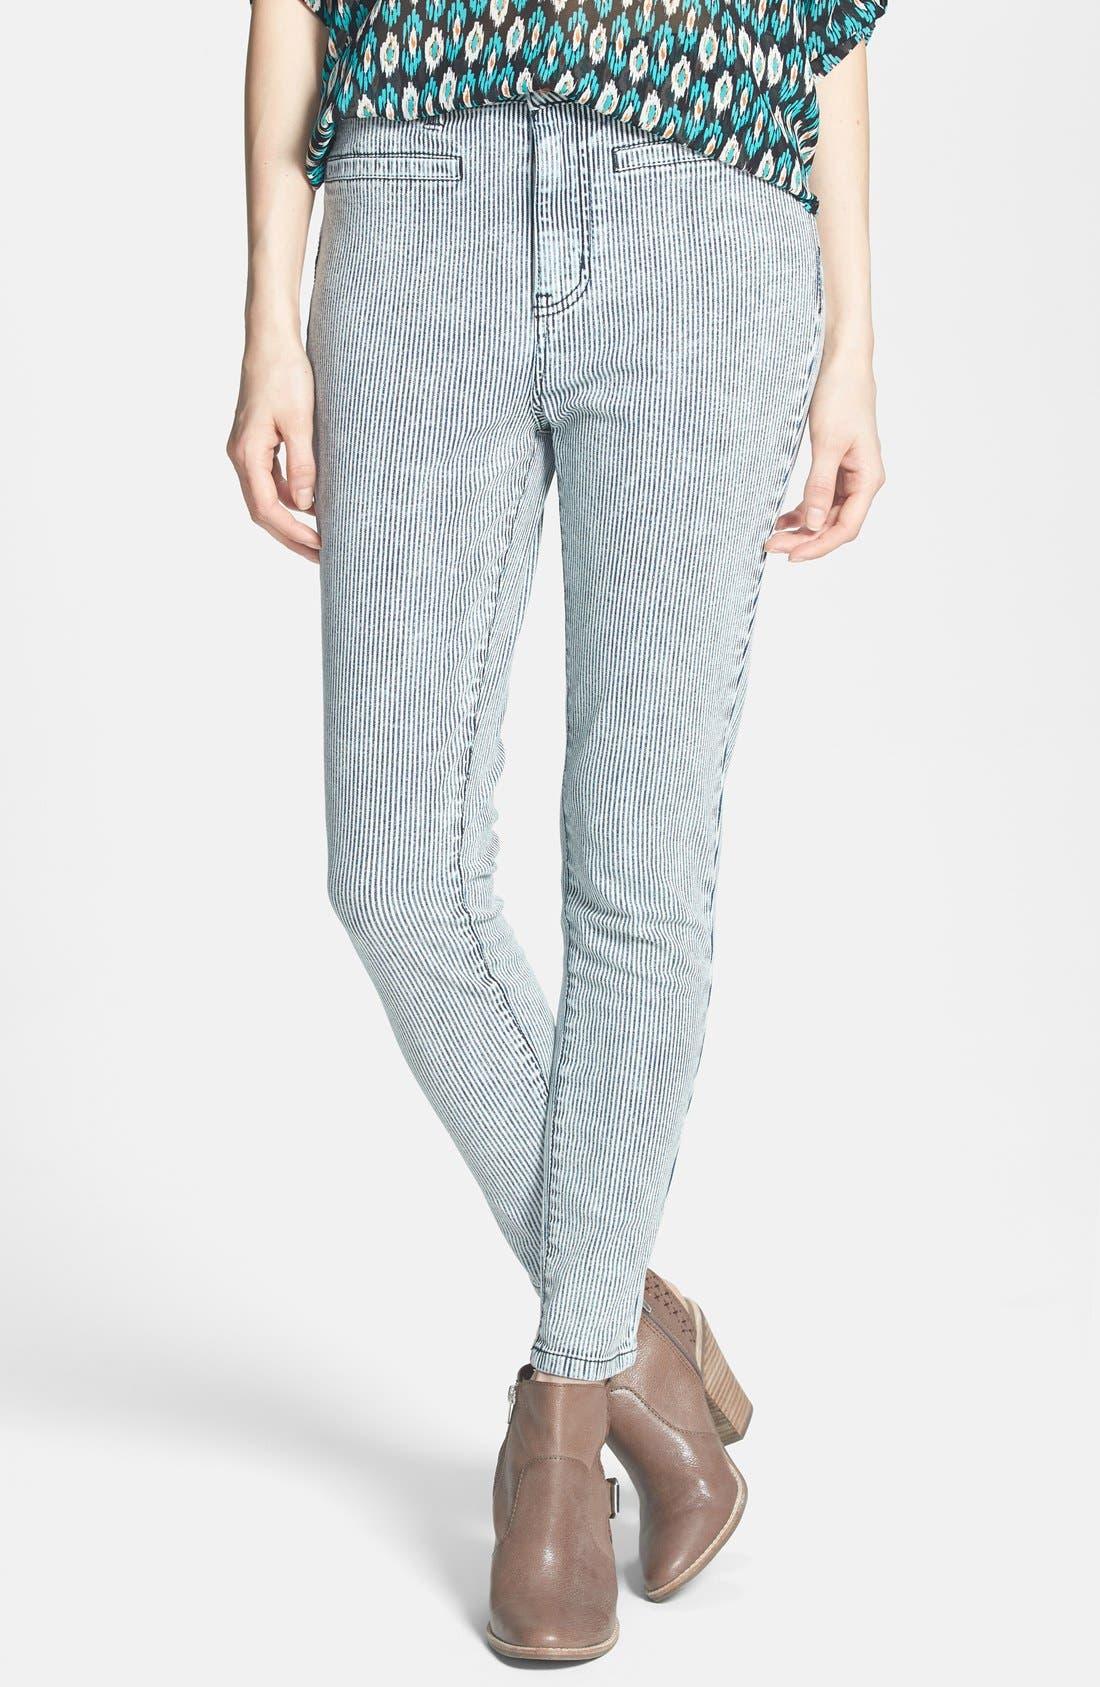 Main Image - Fire High Waist Skinny Jeans (Railroad Stripe) (Juniors)